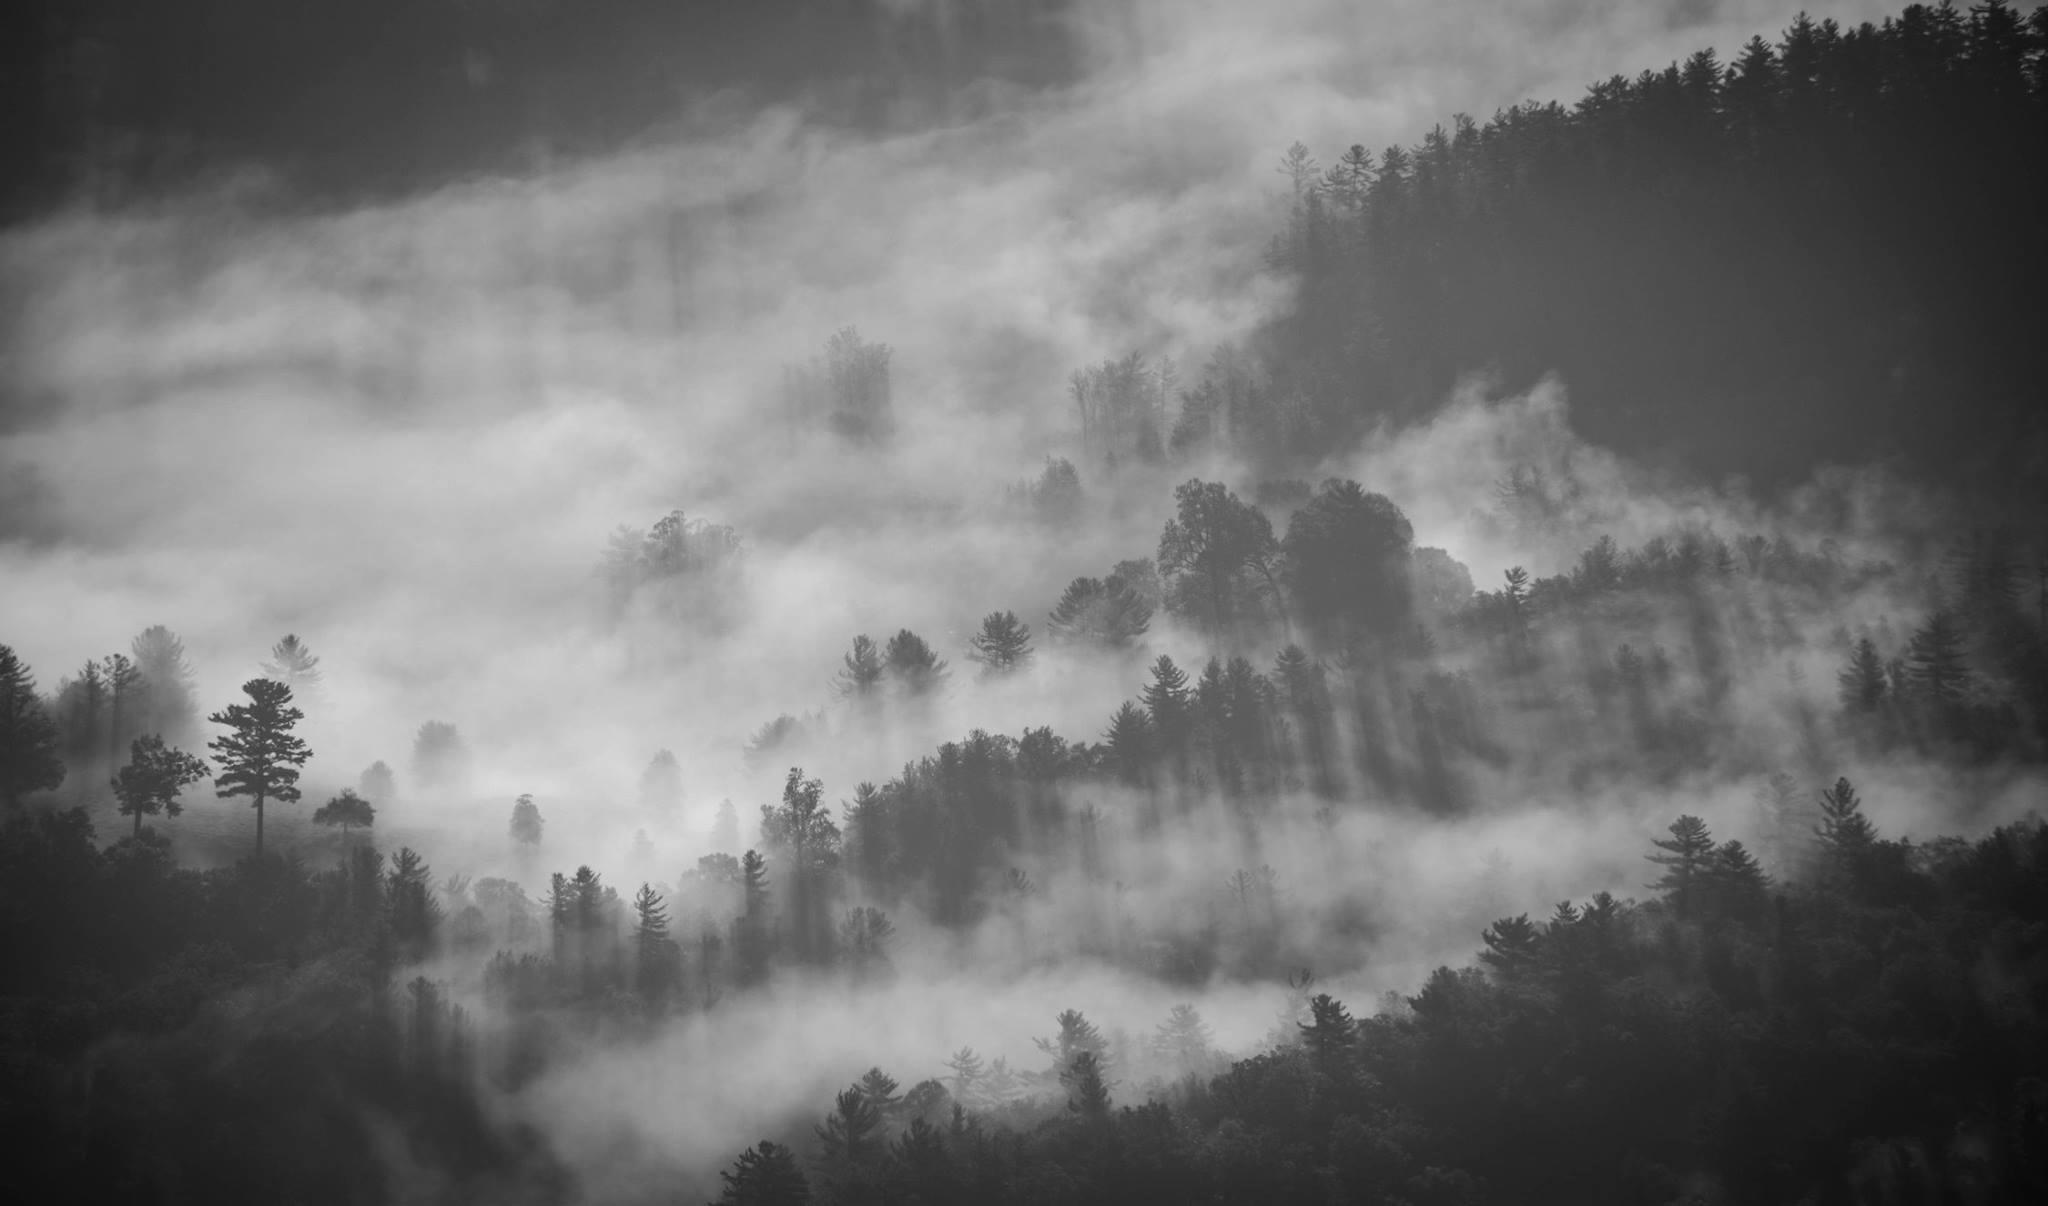 черный туман картинки монтируются любую